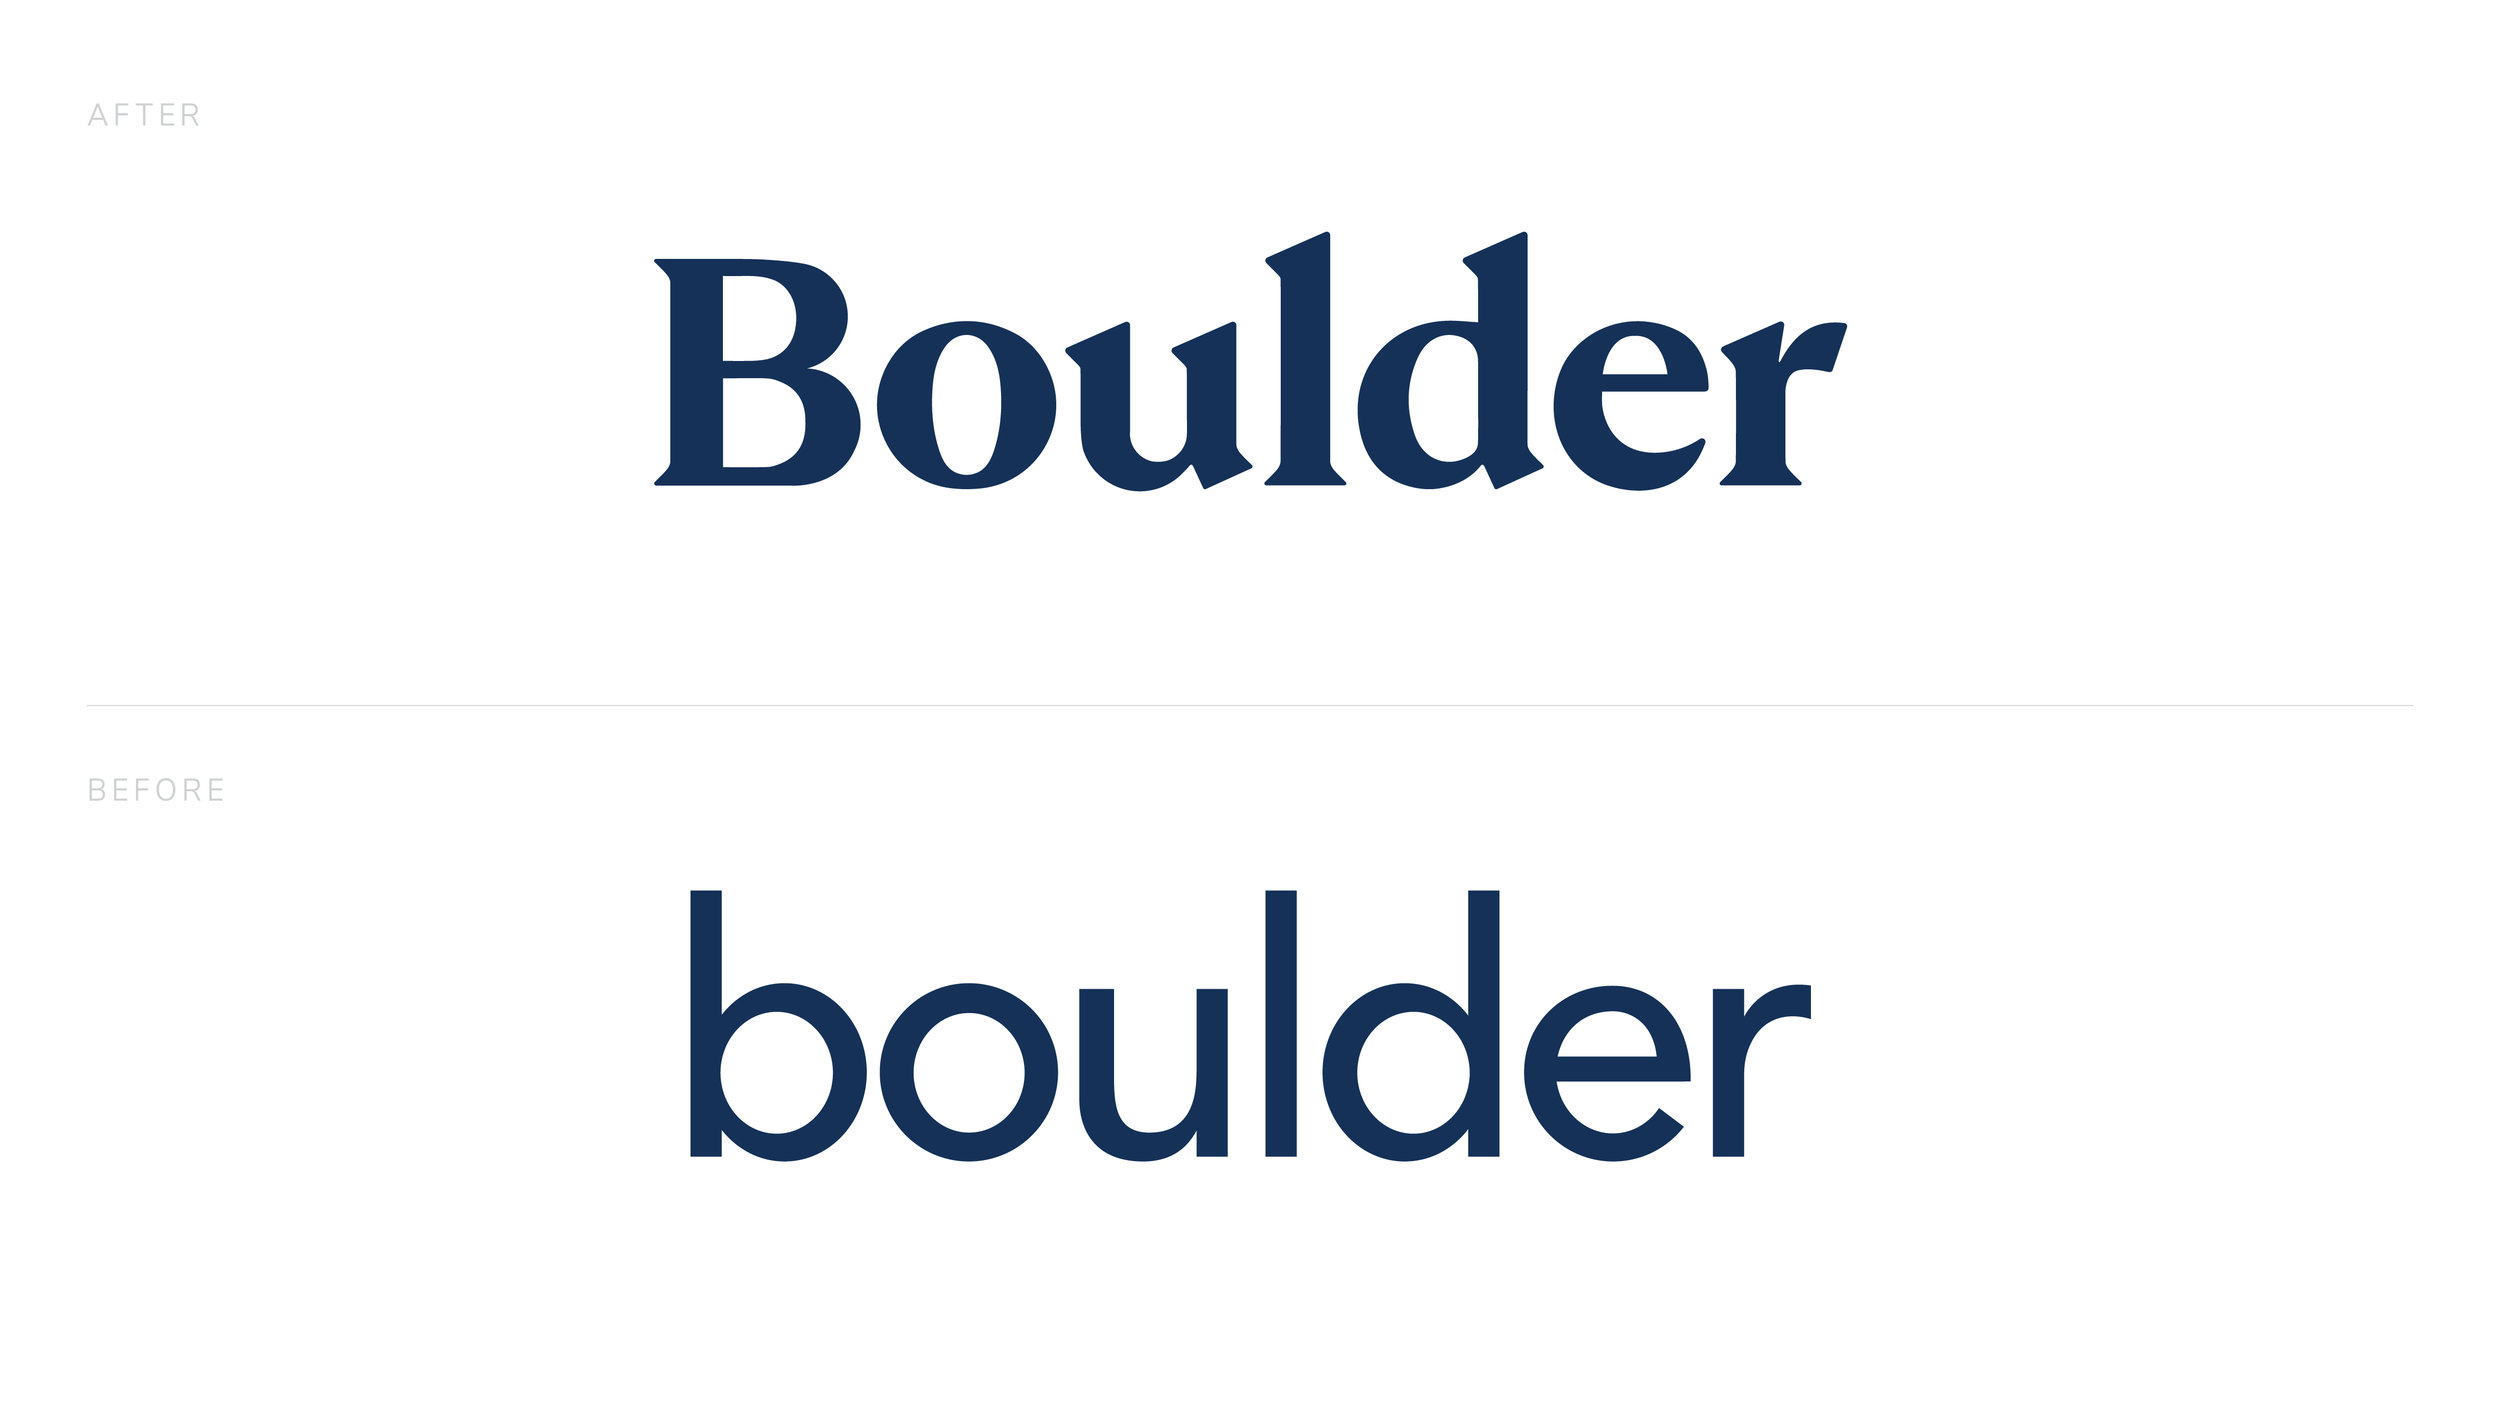 EnlistedWeb_Boulder_VisualAssets_Brand- Type.jpg